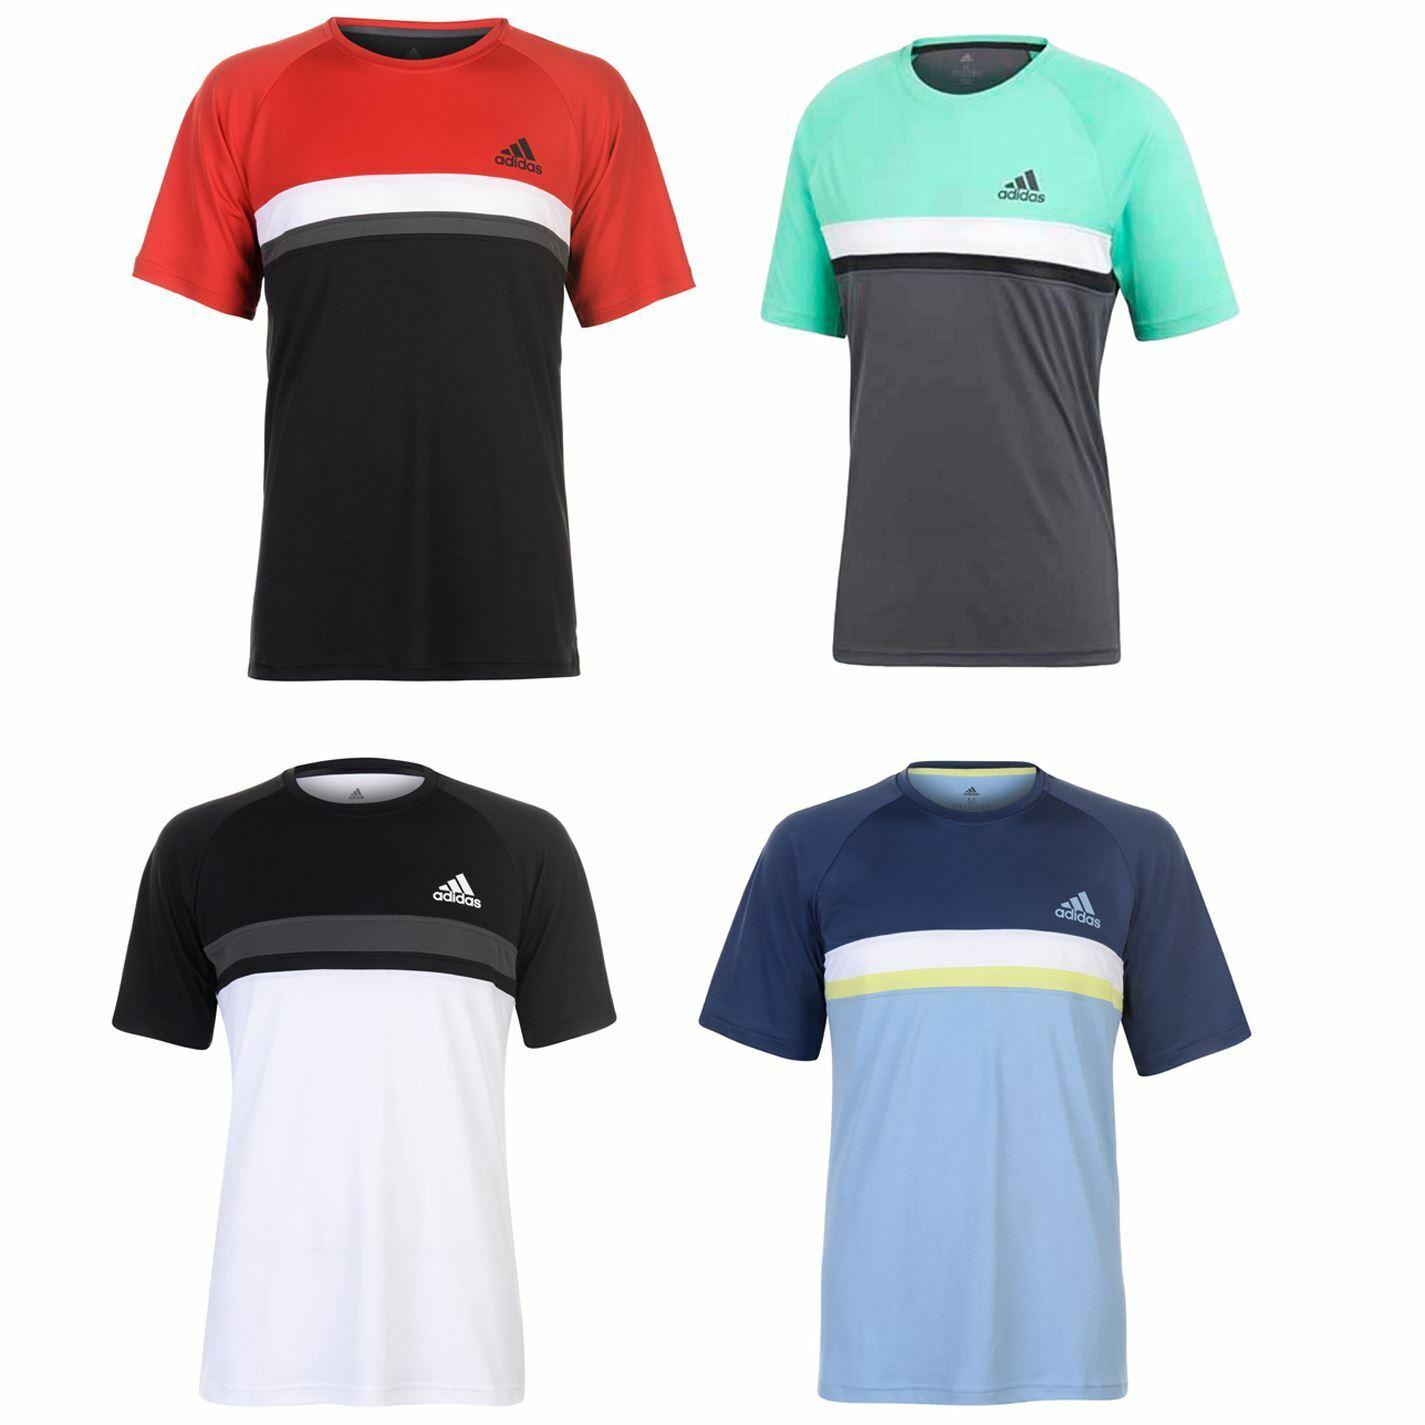 Adidas Club Tennis T-Shirt Mens Top Tee Shirt Sportwear